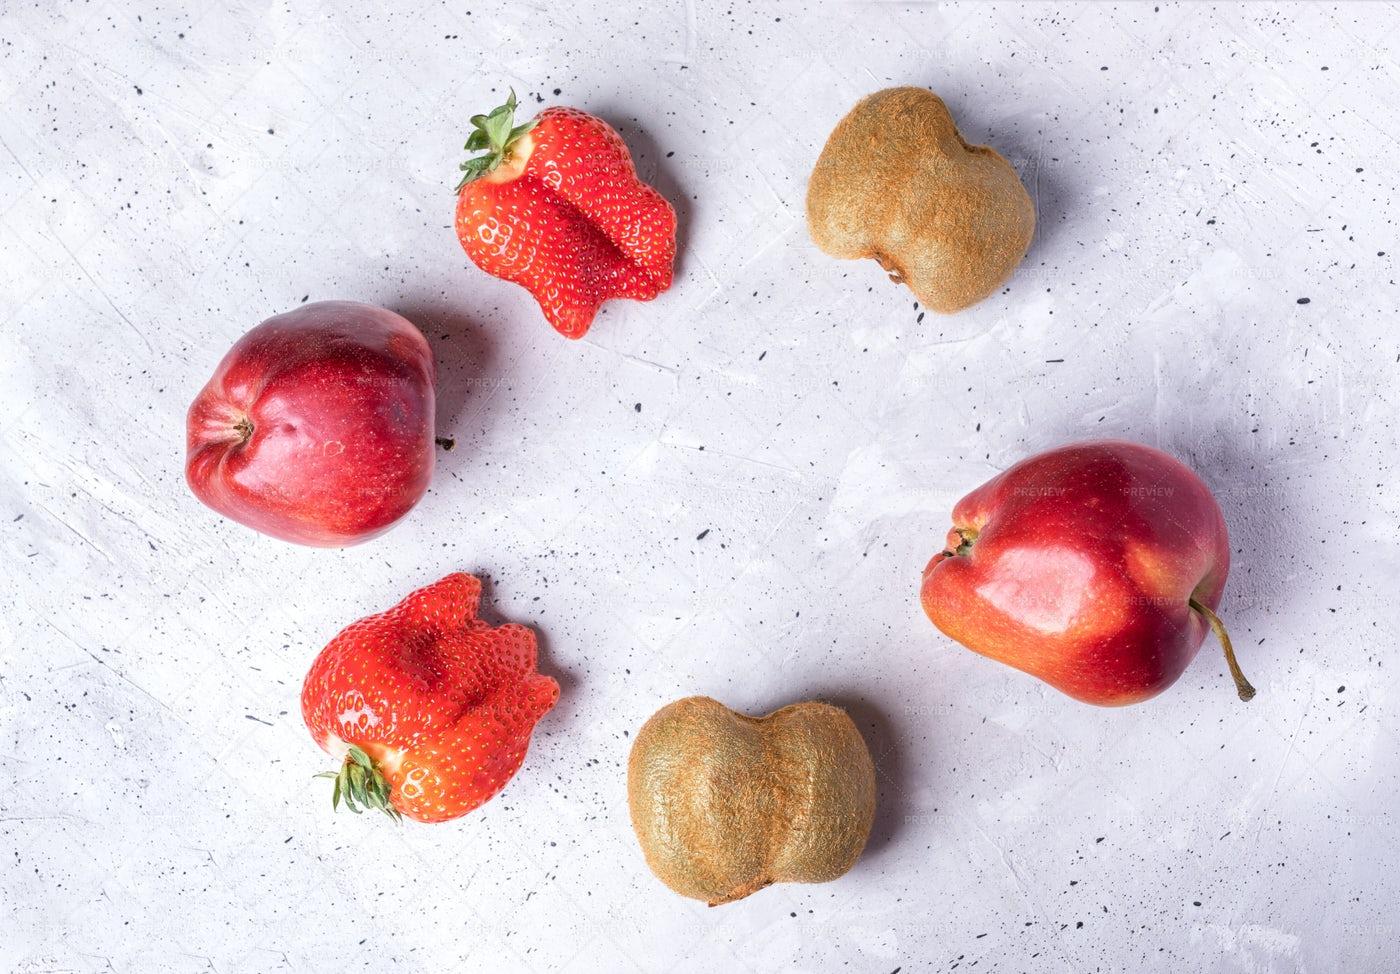 Ugly Fruits: Stock Photos